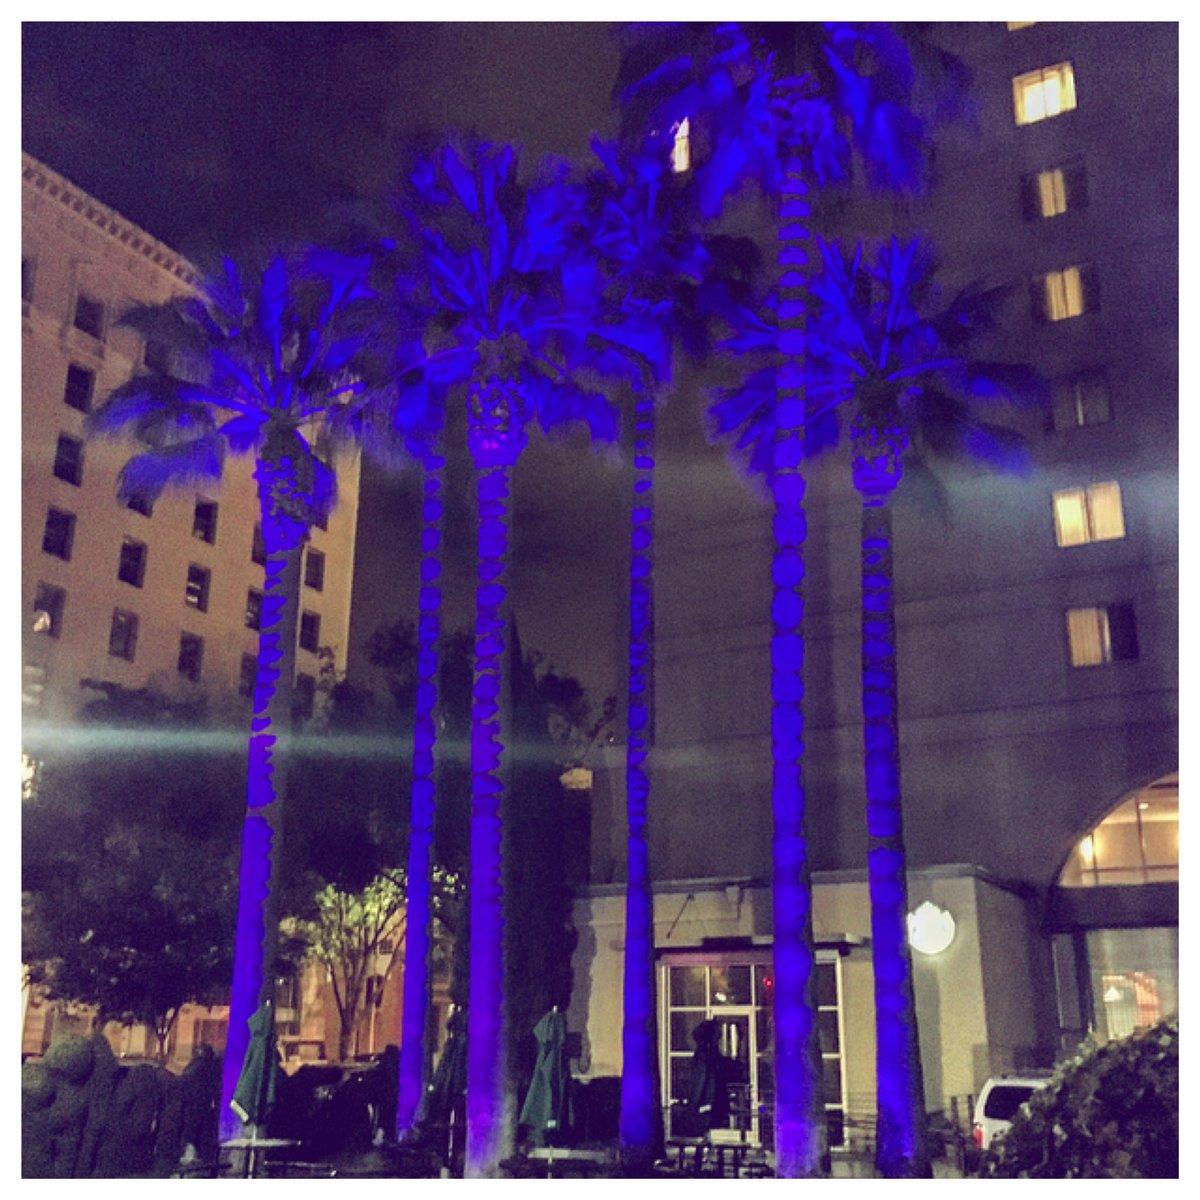 #prince #purplerain RIPprince #downtownsacramento https://t.co/GPTrxkcbRy